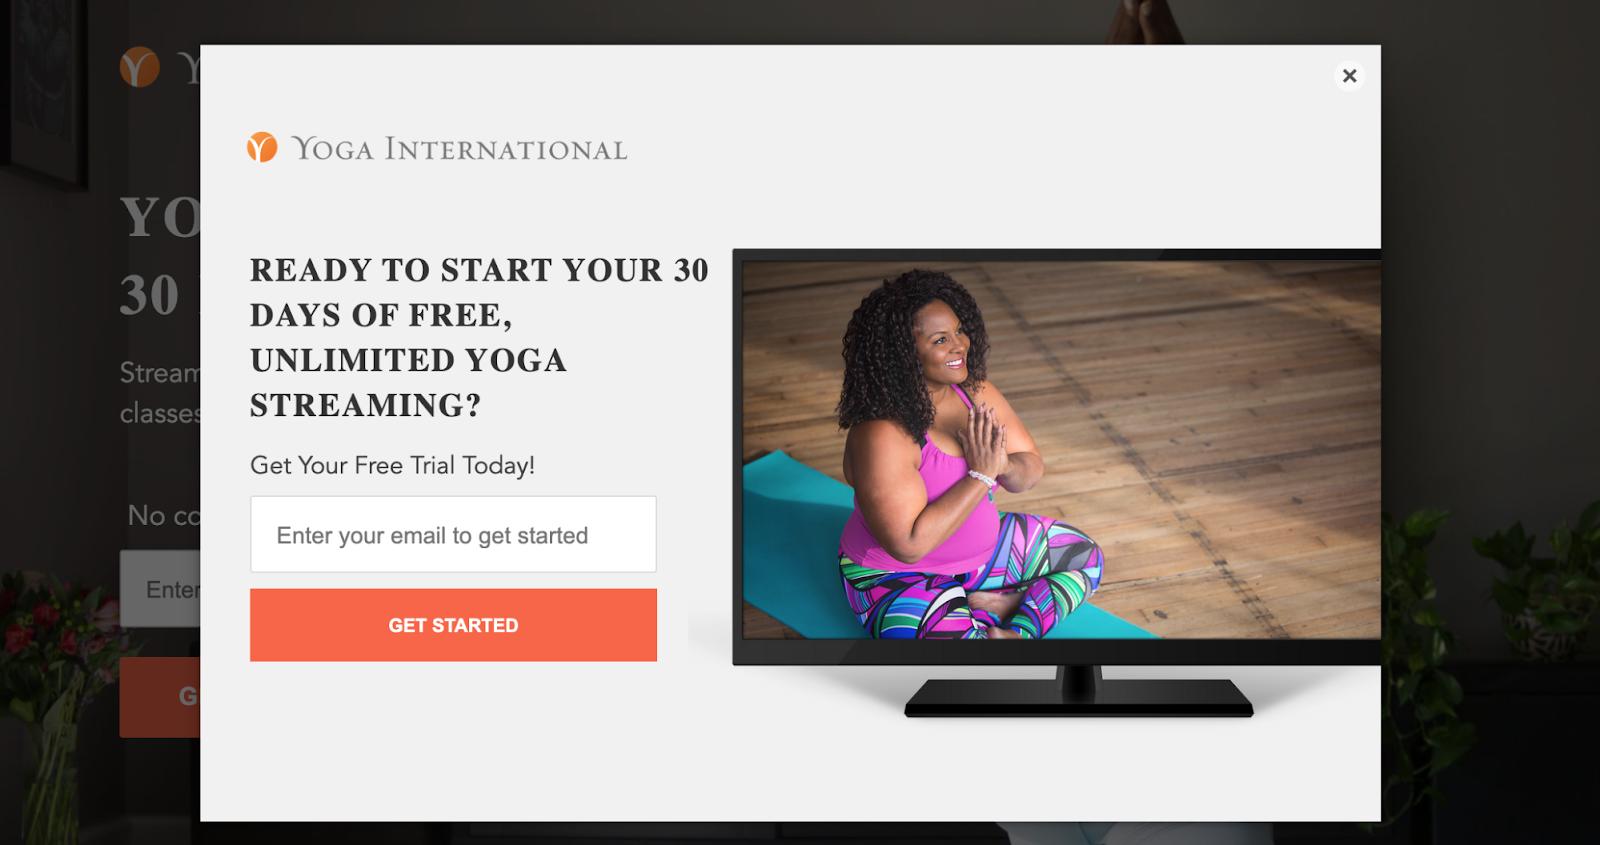 Yoga International Get Started CTA